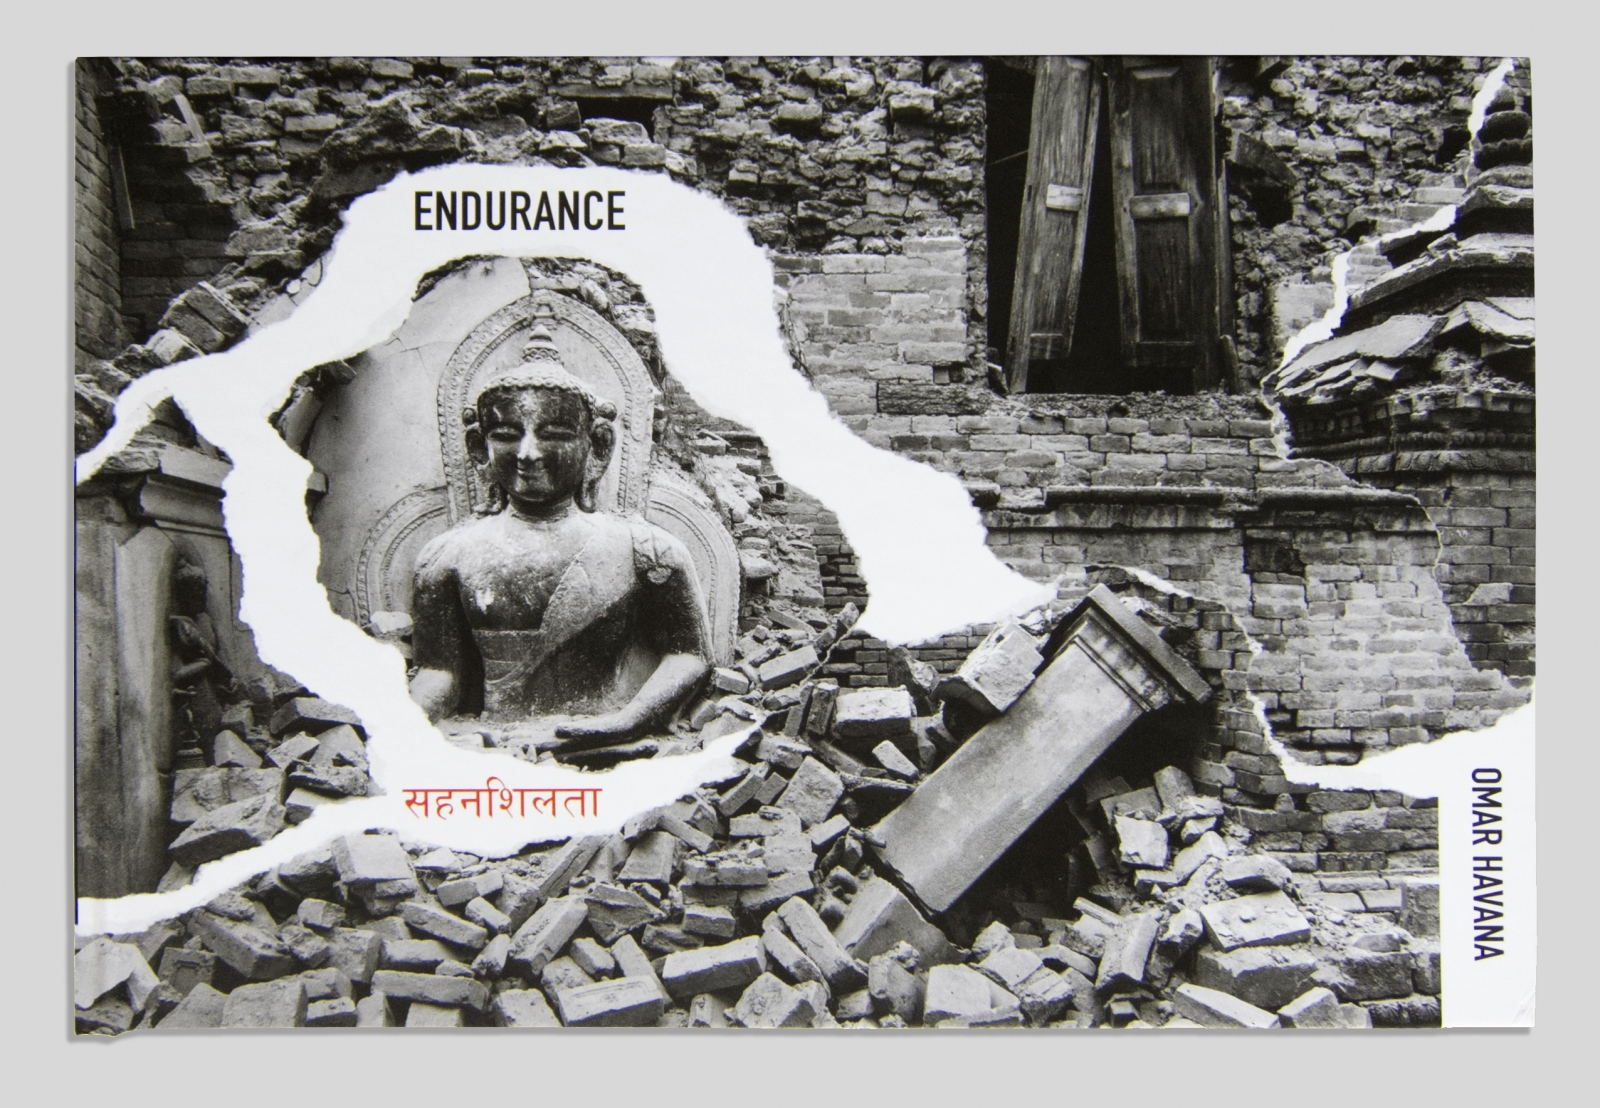 Endurance By Omar Havana FotoEvidence, 2016